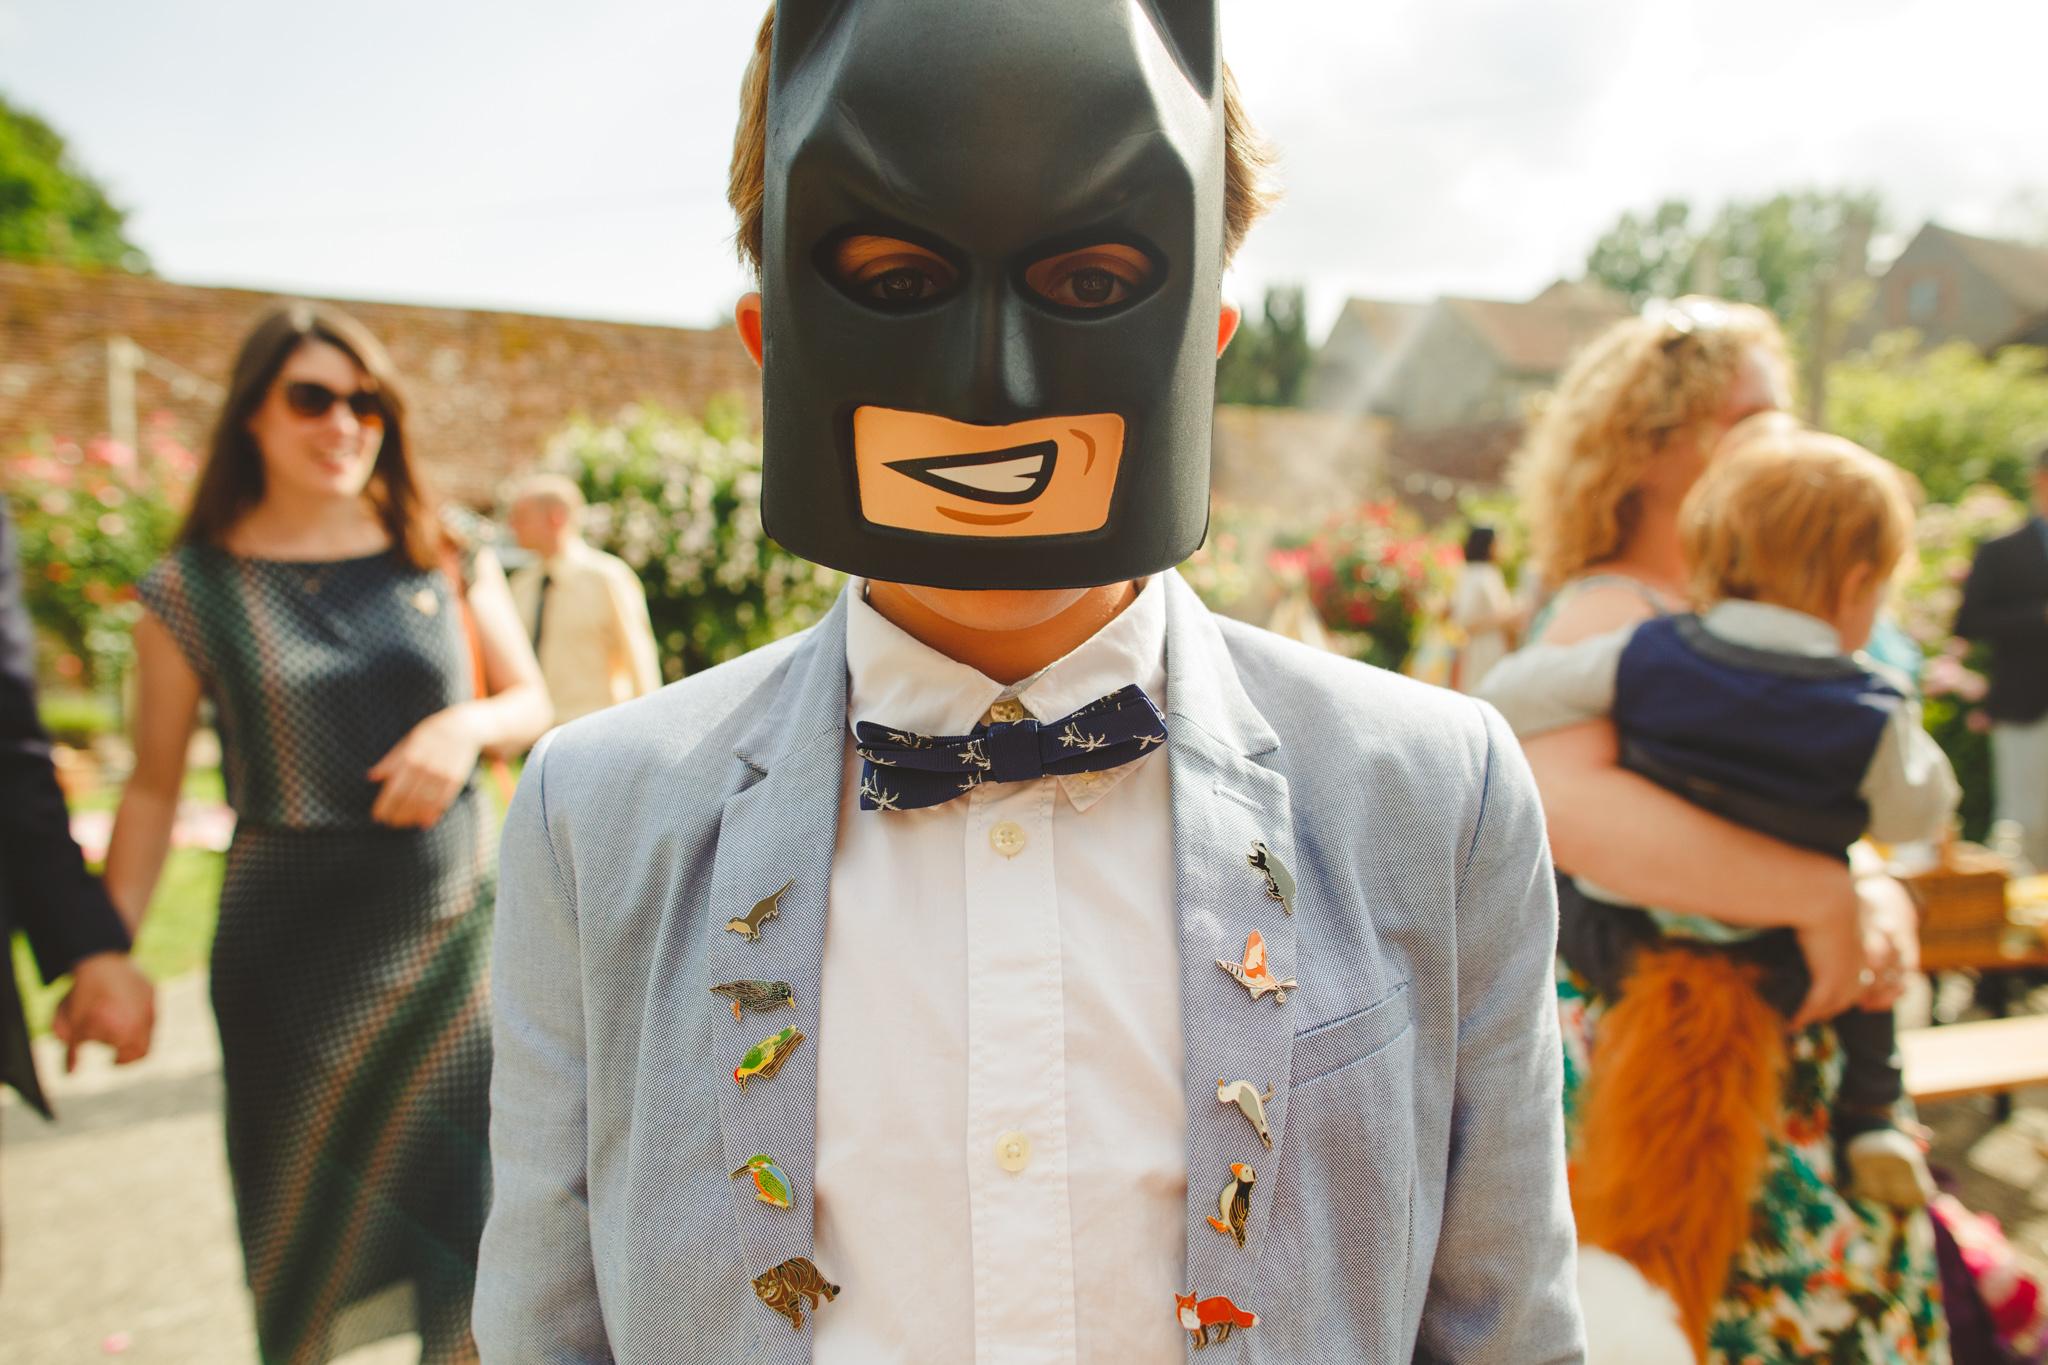 wes-anderson-themed-wedding-21.jpg